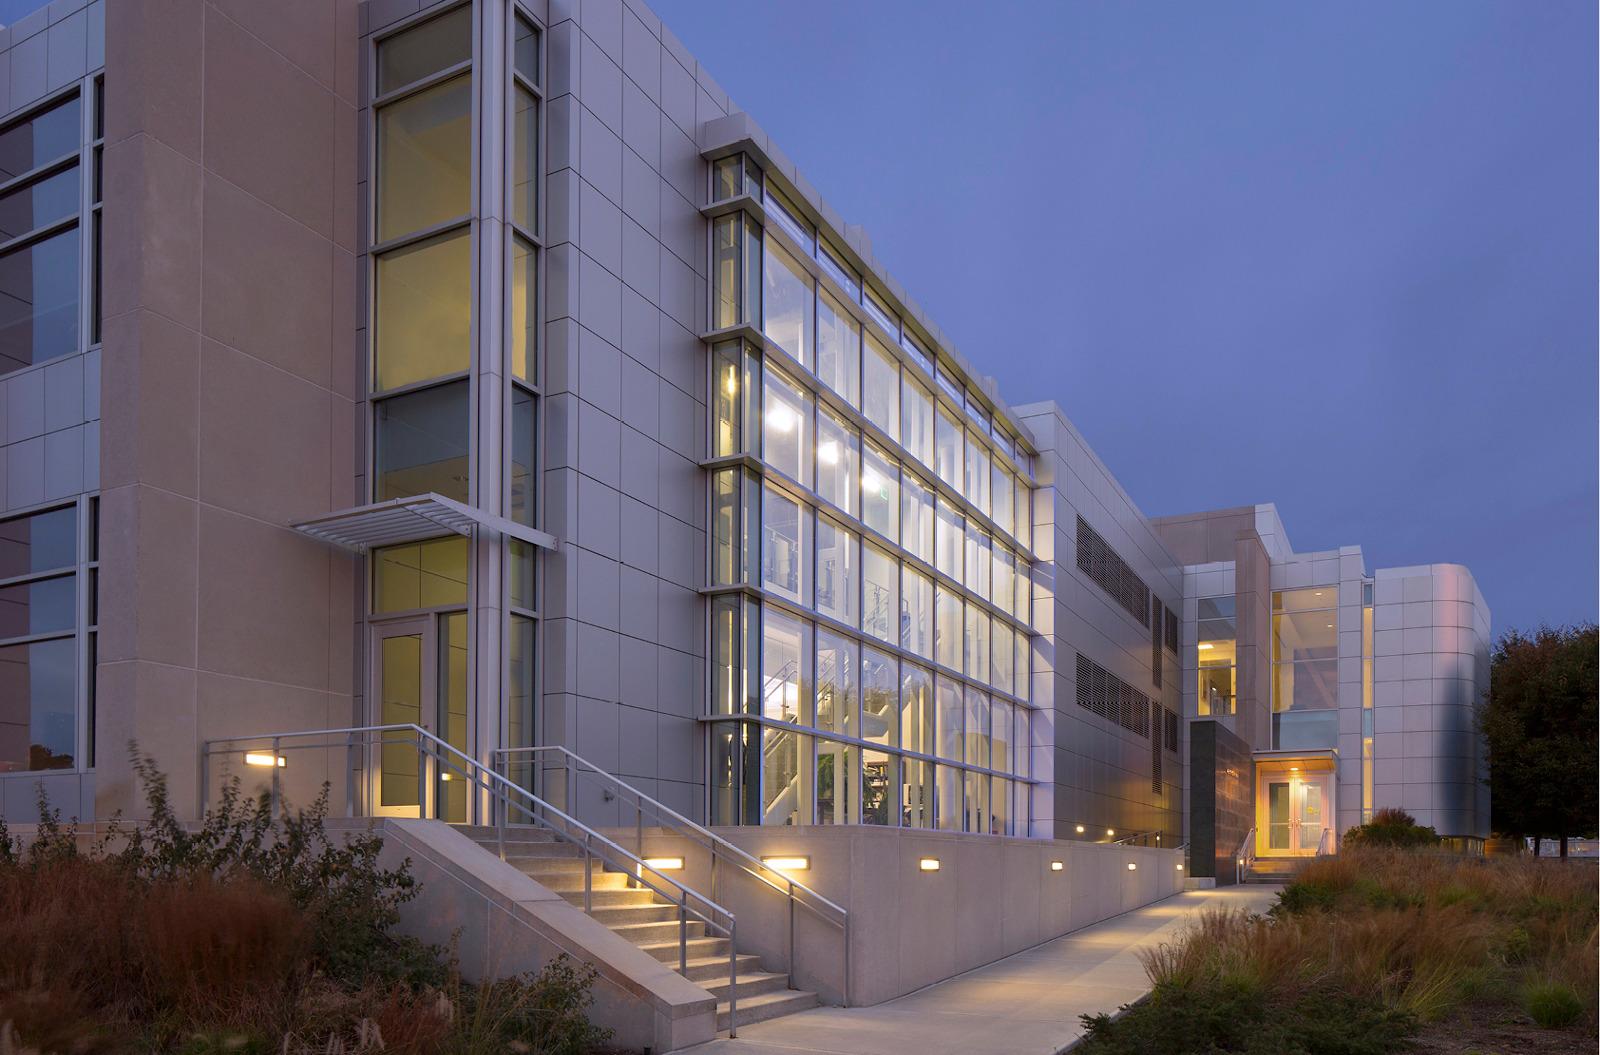 Purdue University - Bindley Bioscience Engineering Center